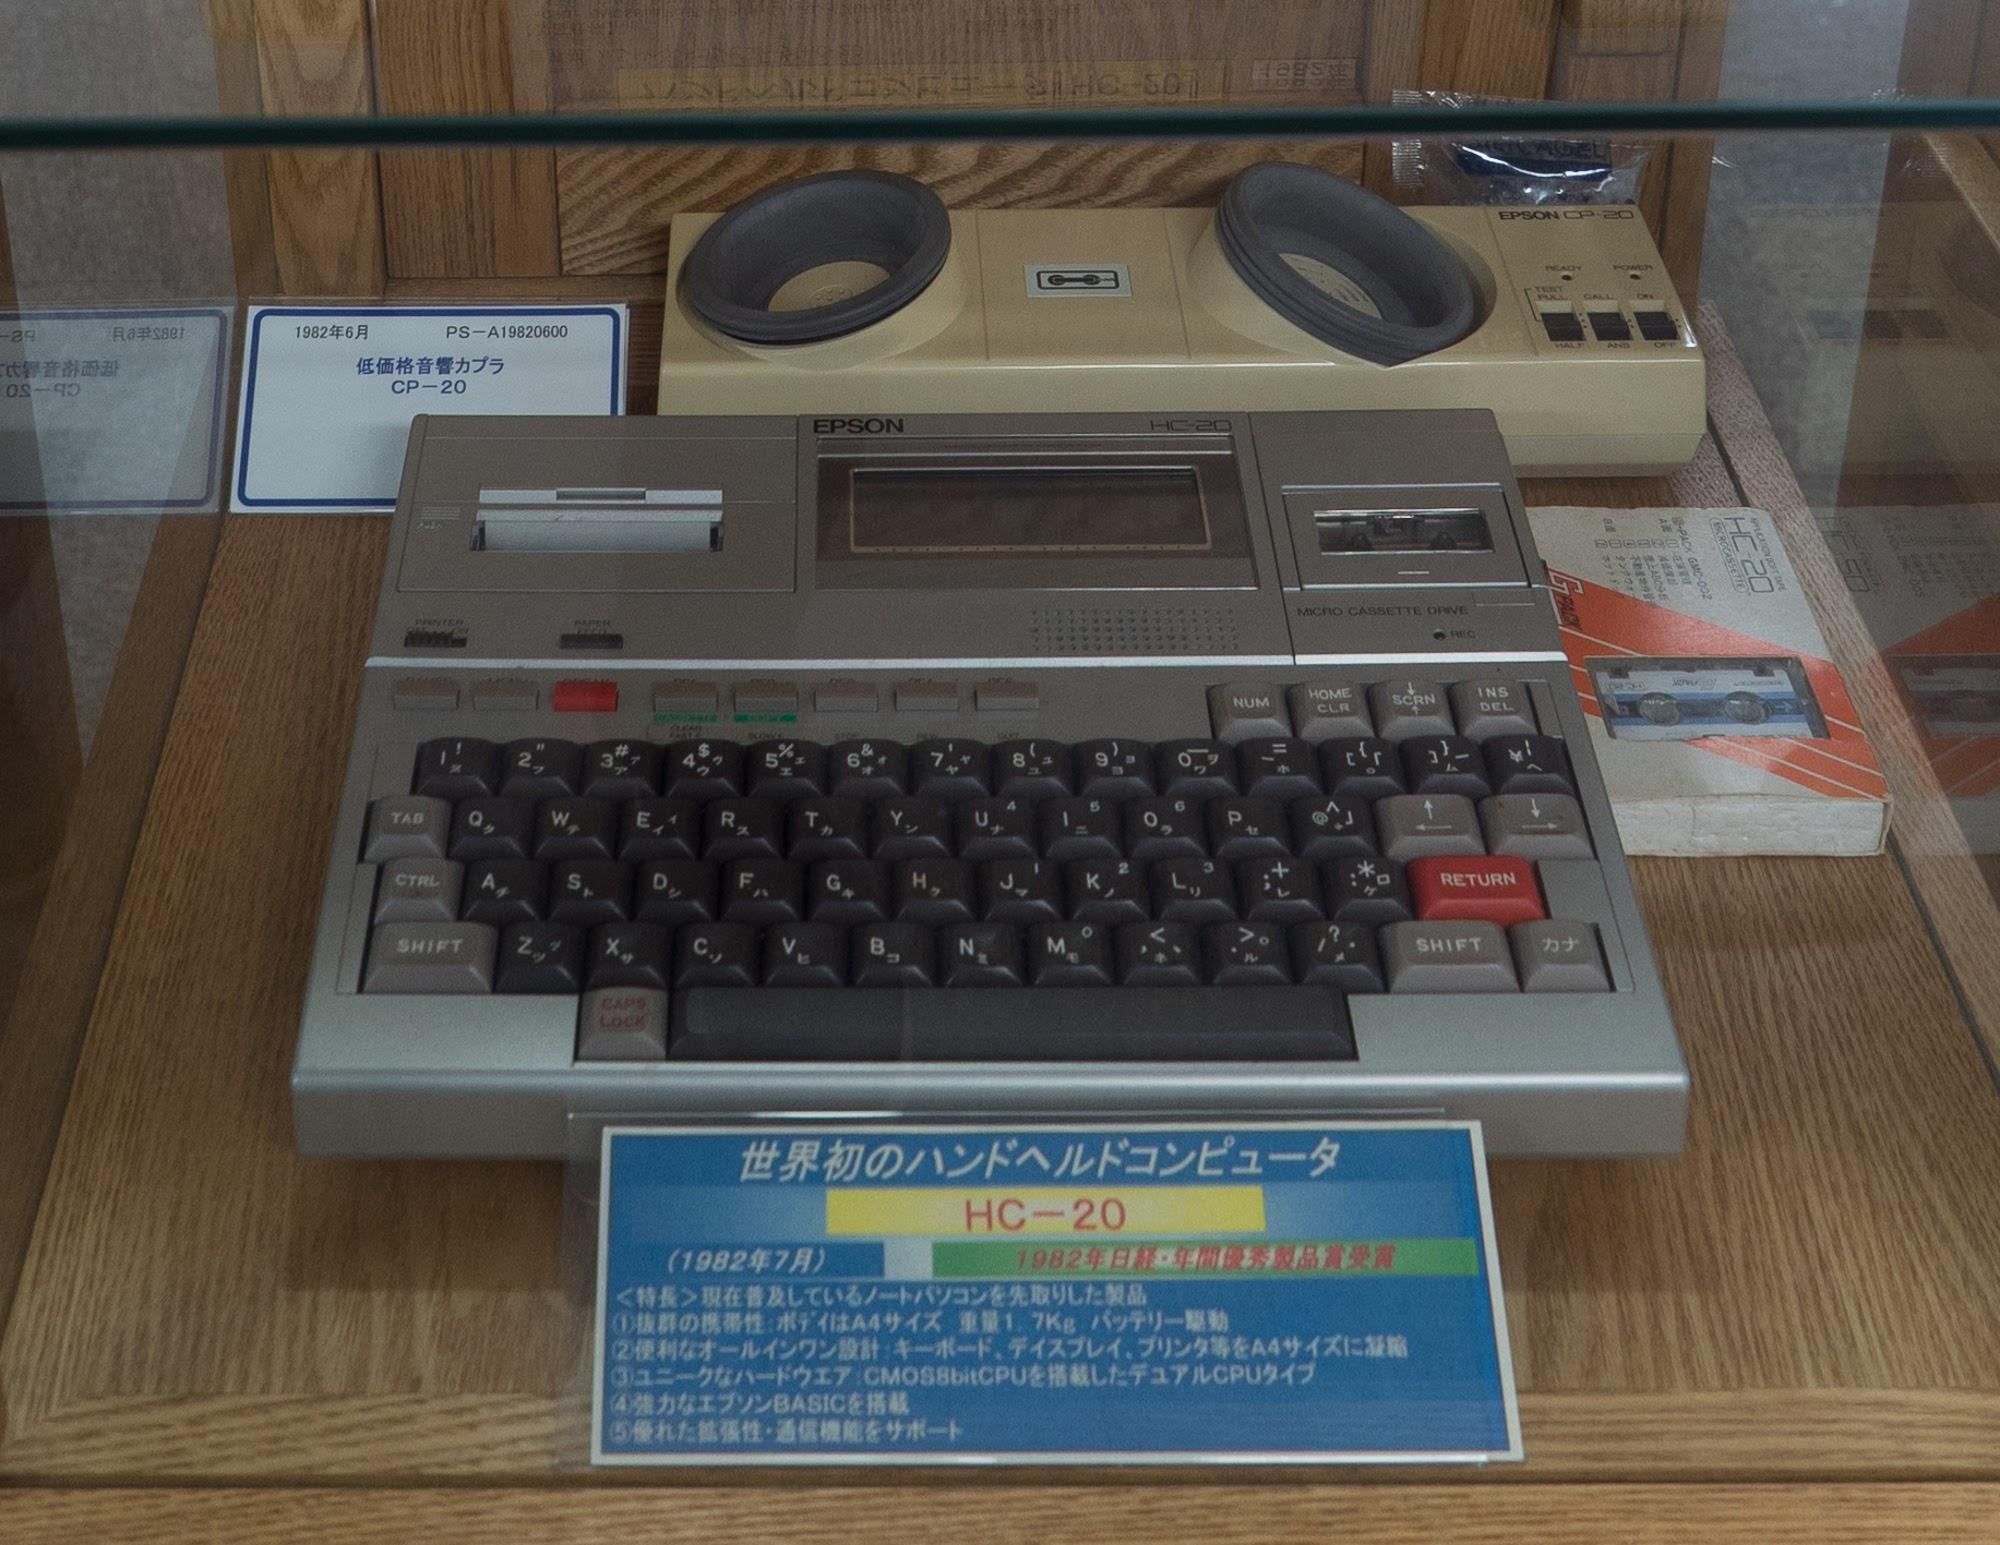 HC-20 Computer